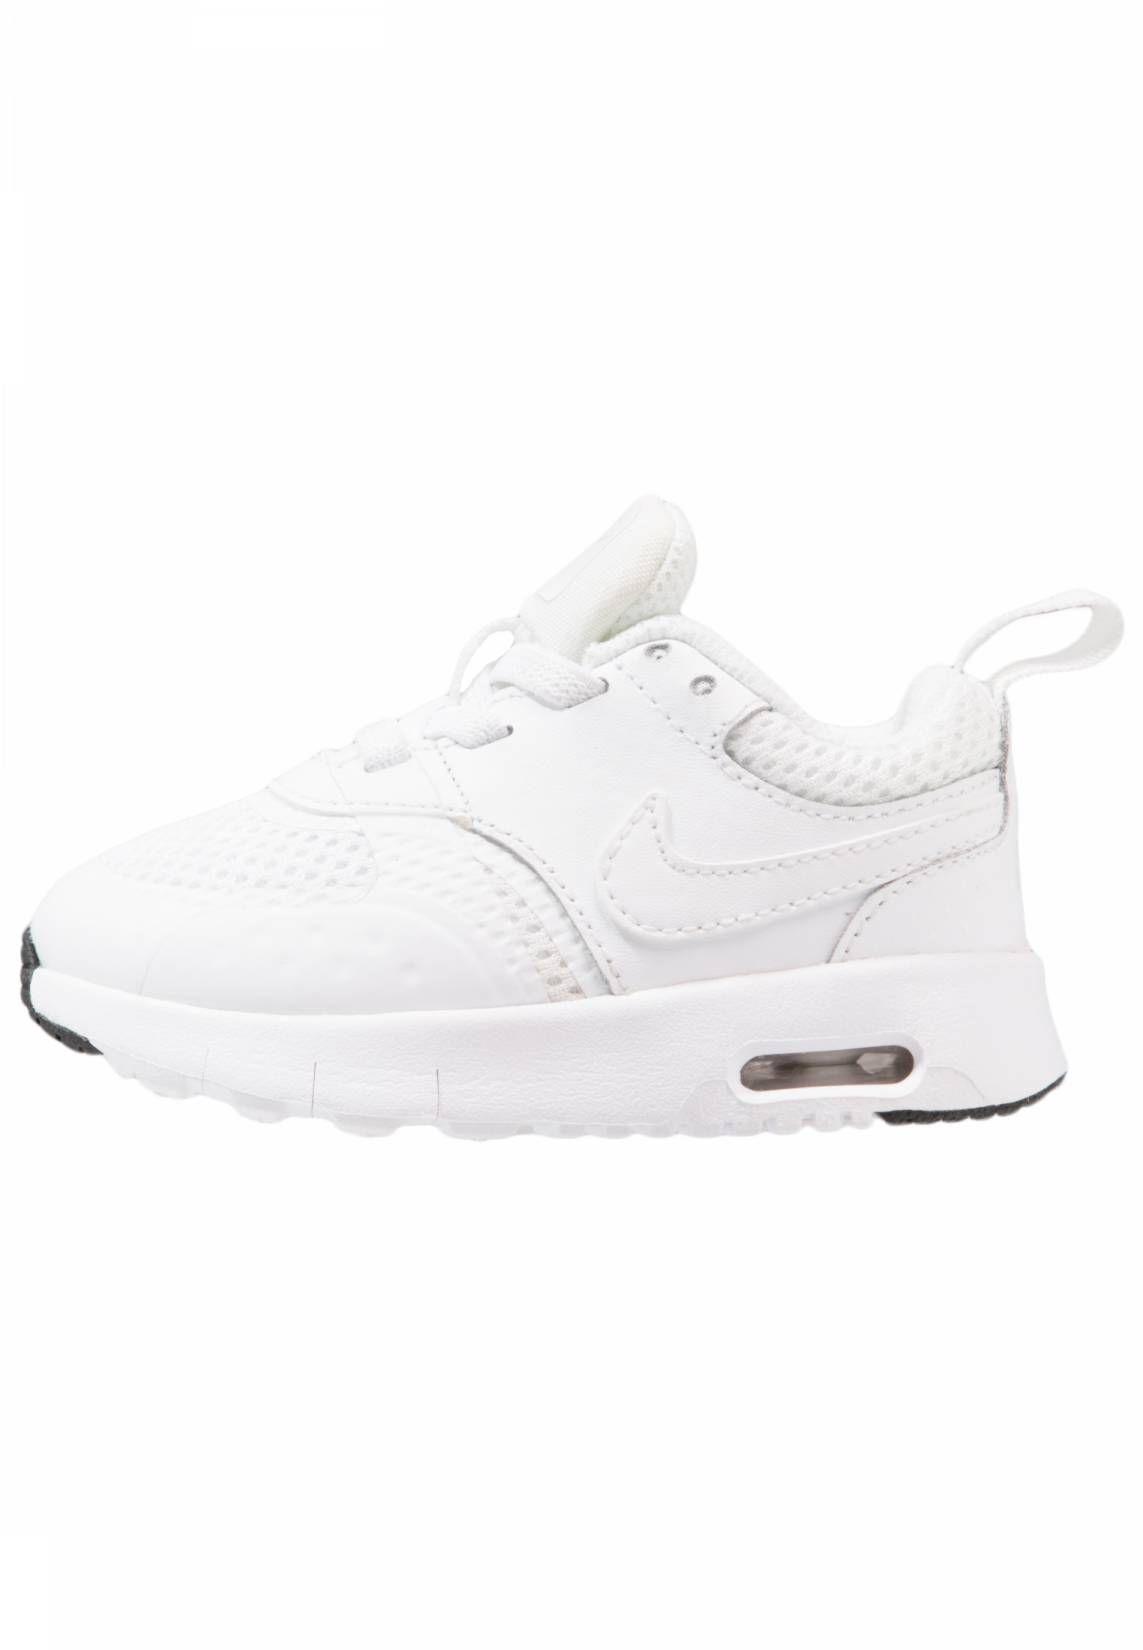 Nike Sportswear. AIR MAX VISION (TDE) Sneaker low white